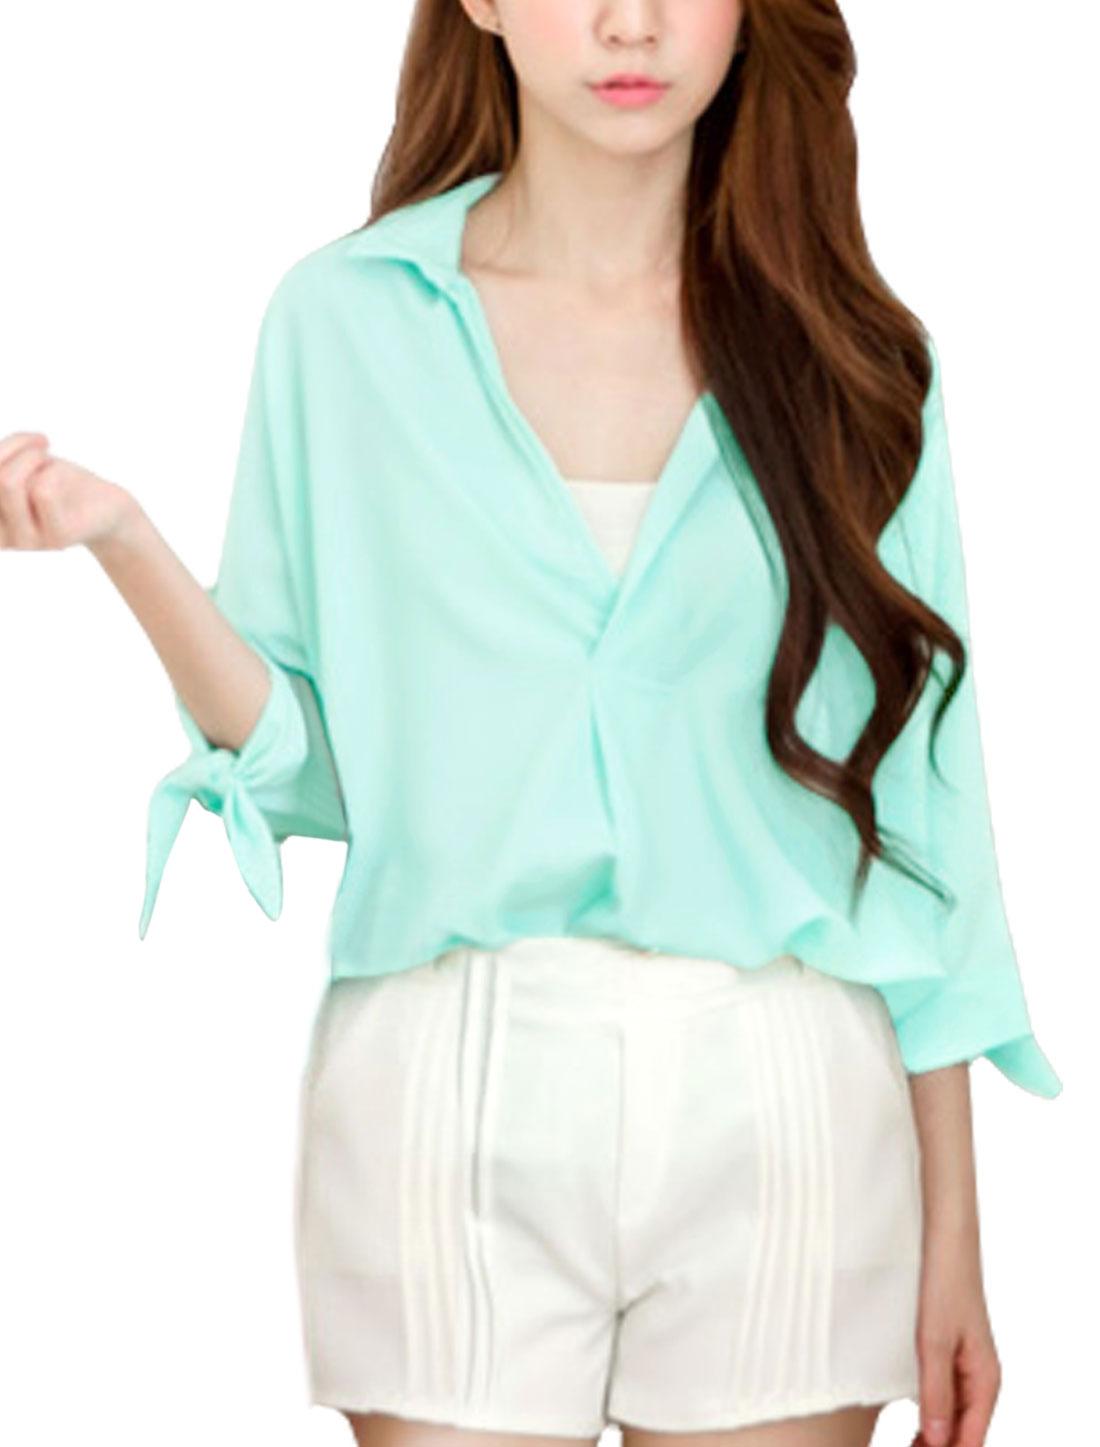 Women 3/4 Batwing Sleeves Semi Sheer V Neckline Leisure Shirt Mint S